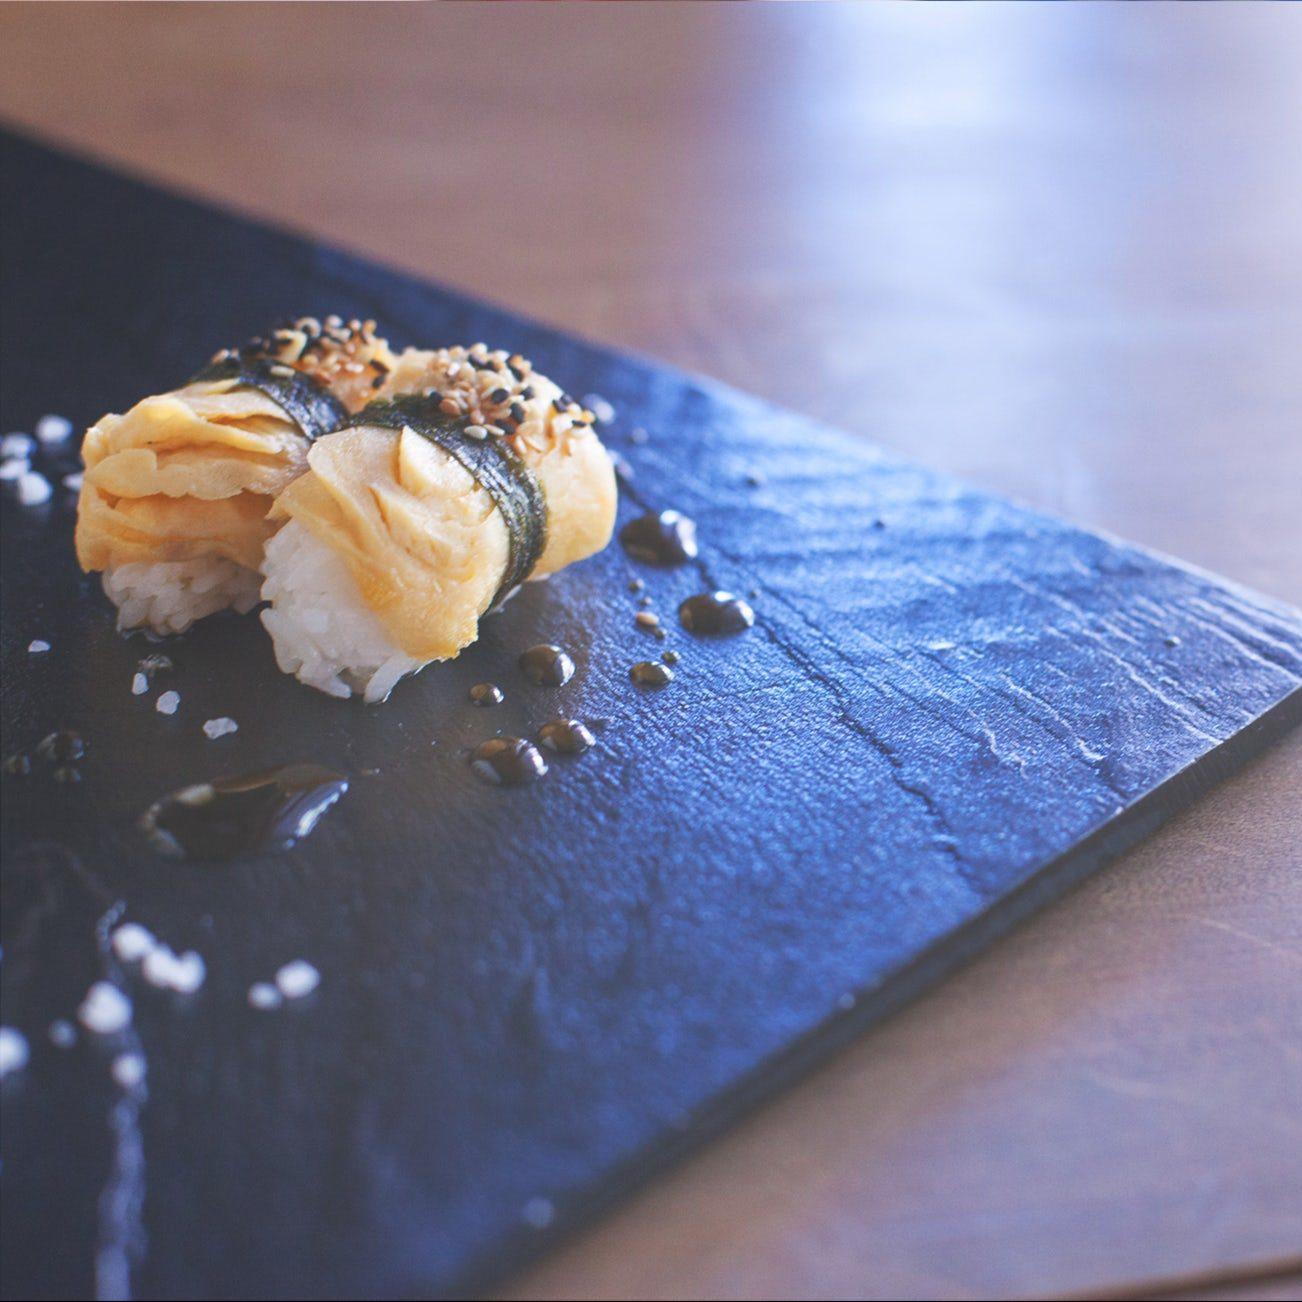 tamago-yaki-rolled-omlet-nourishing-solo-meal-japanese-